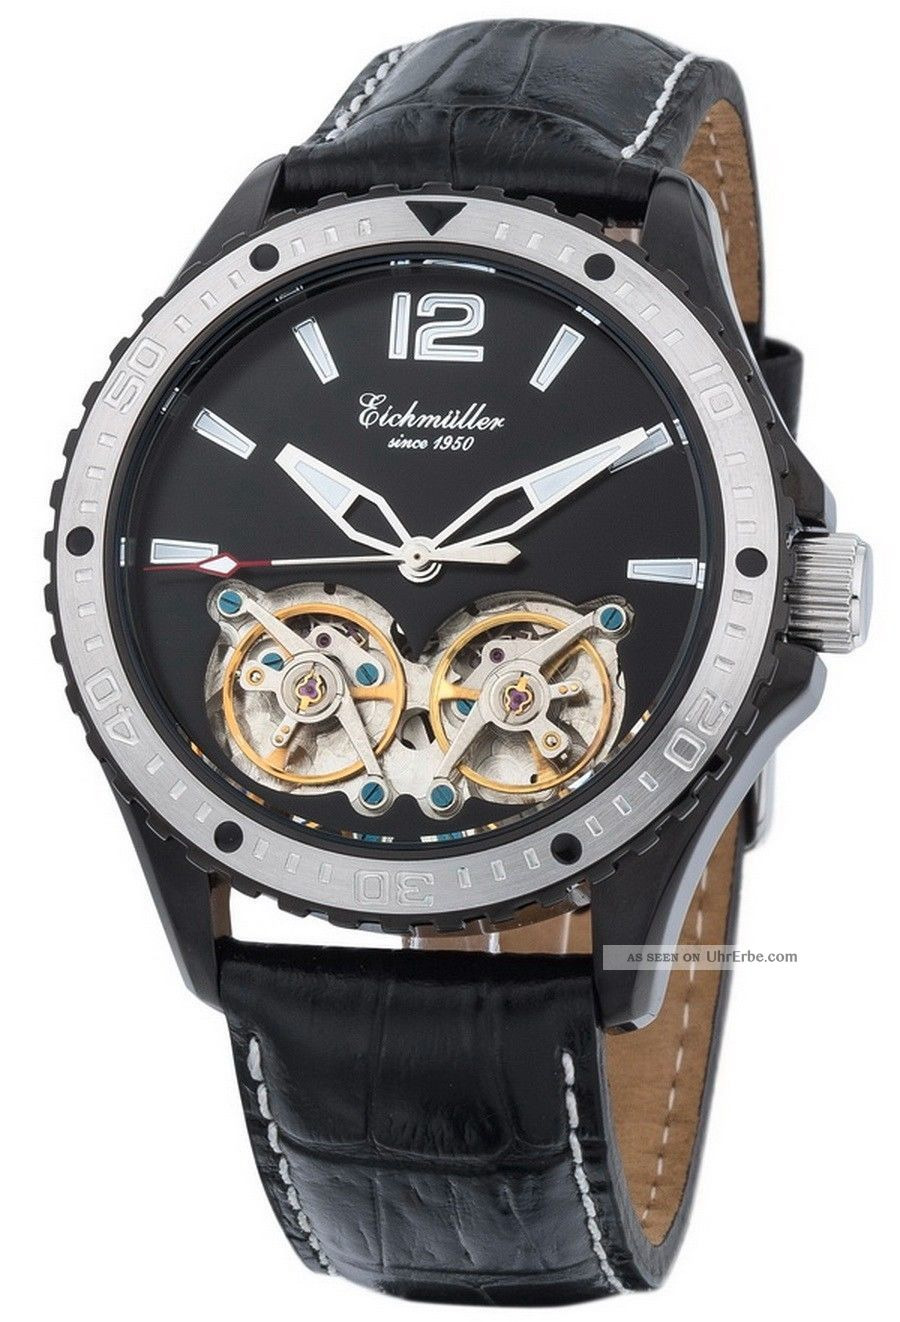 Elegante EichmÜller Automatikuhr 7860 Herrenuhr Business Uhr 2 X Unruh Ip Black Armbanduhren Bild